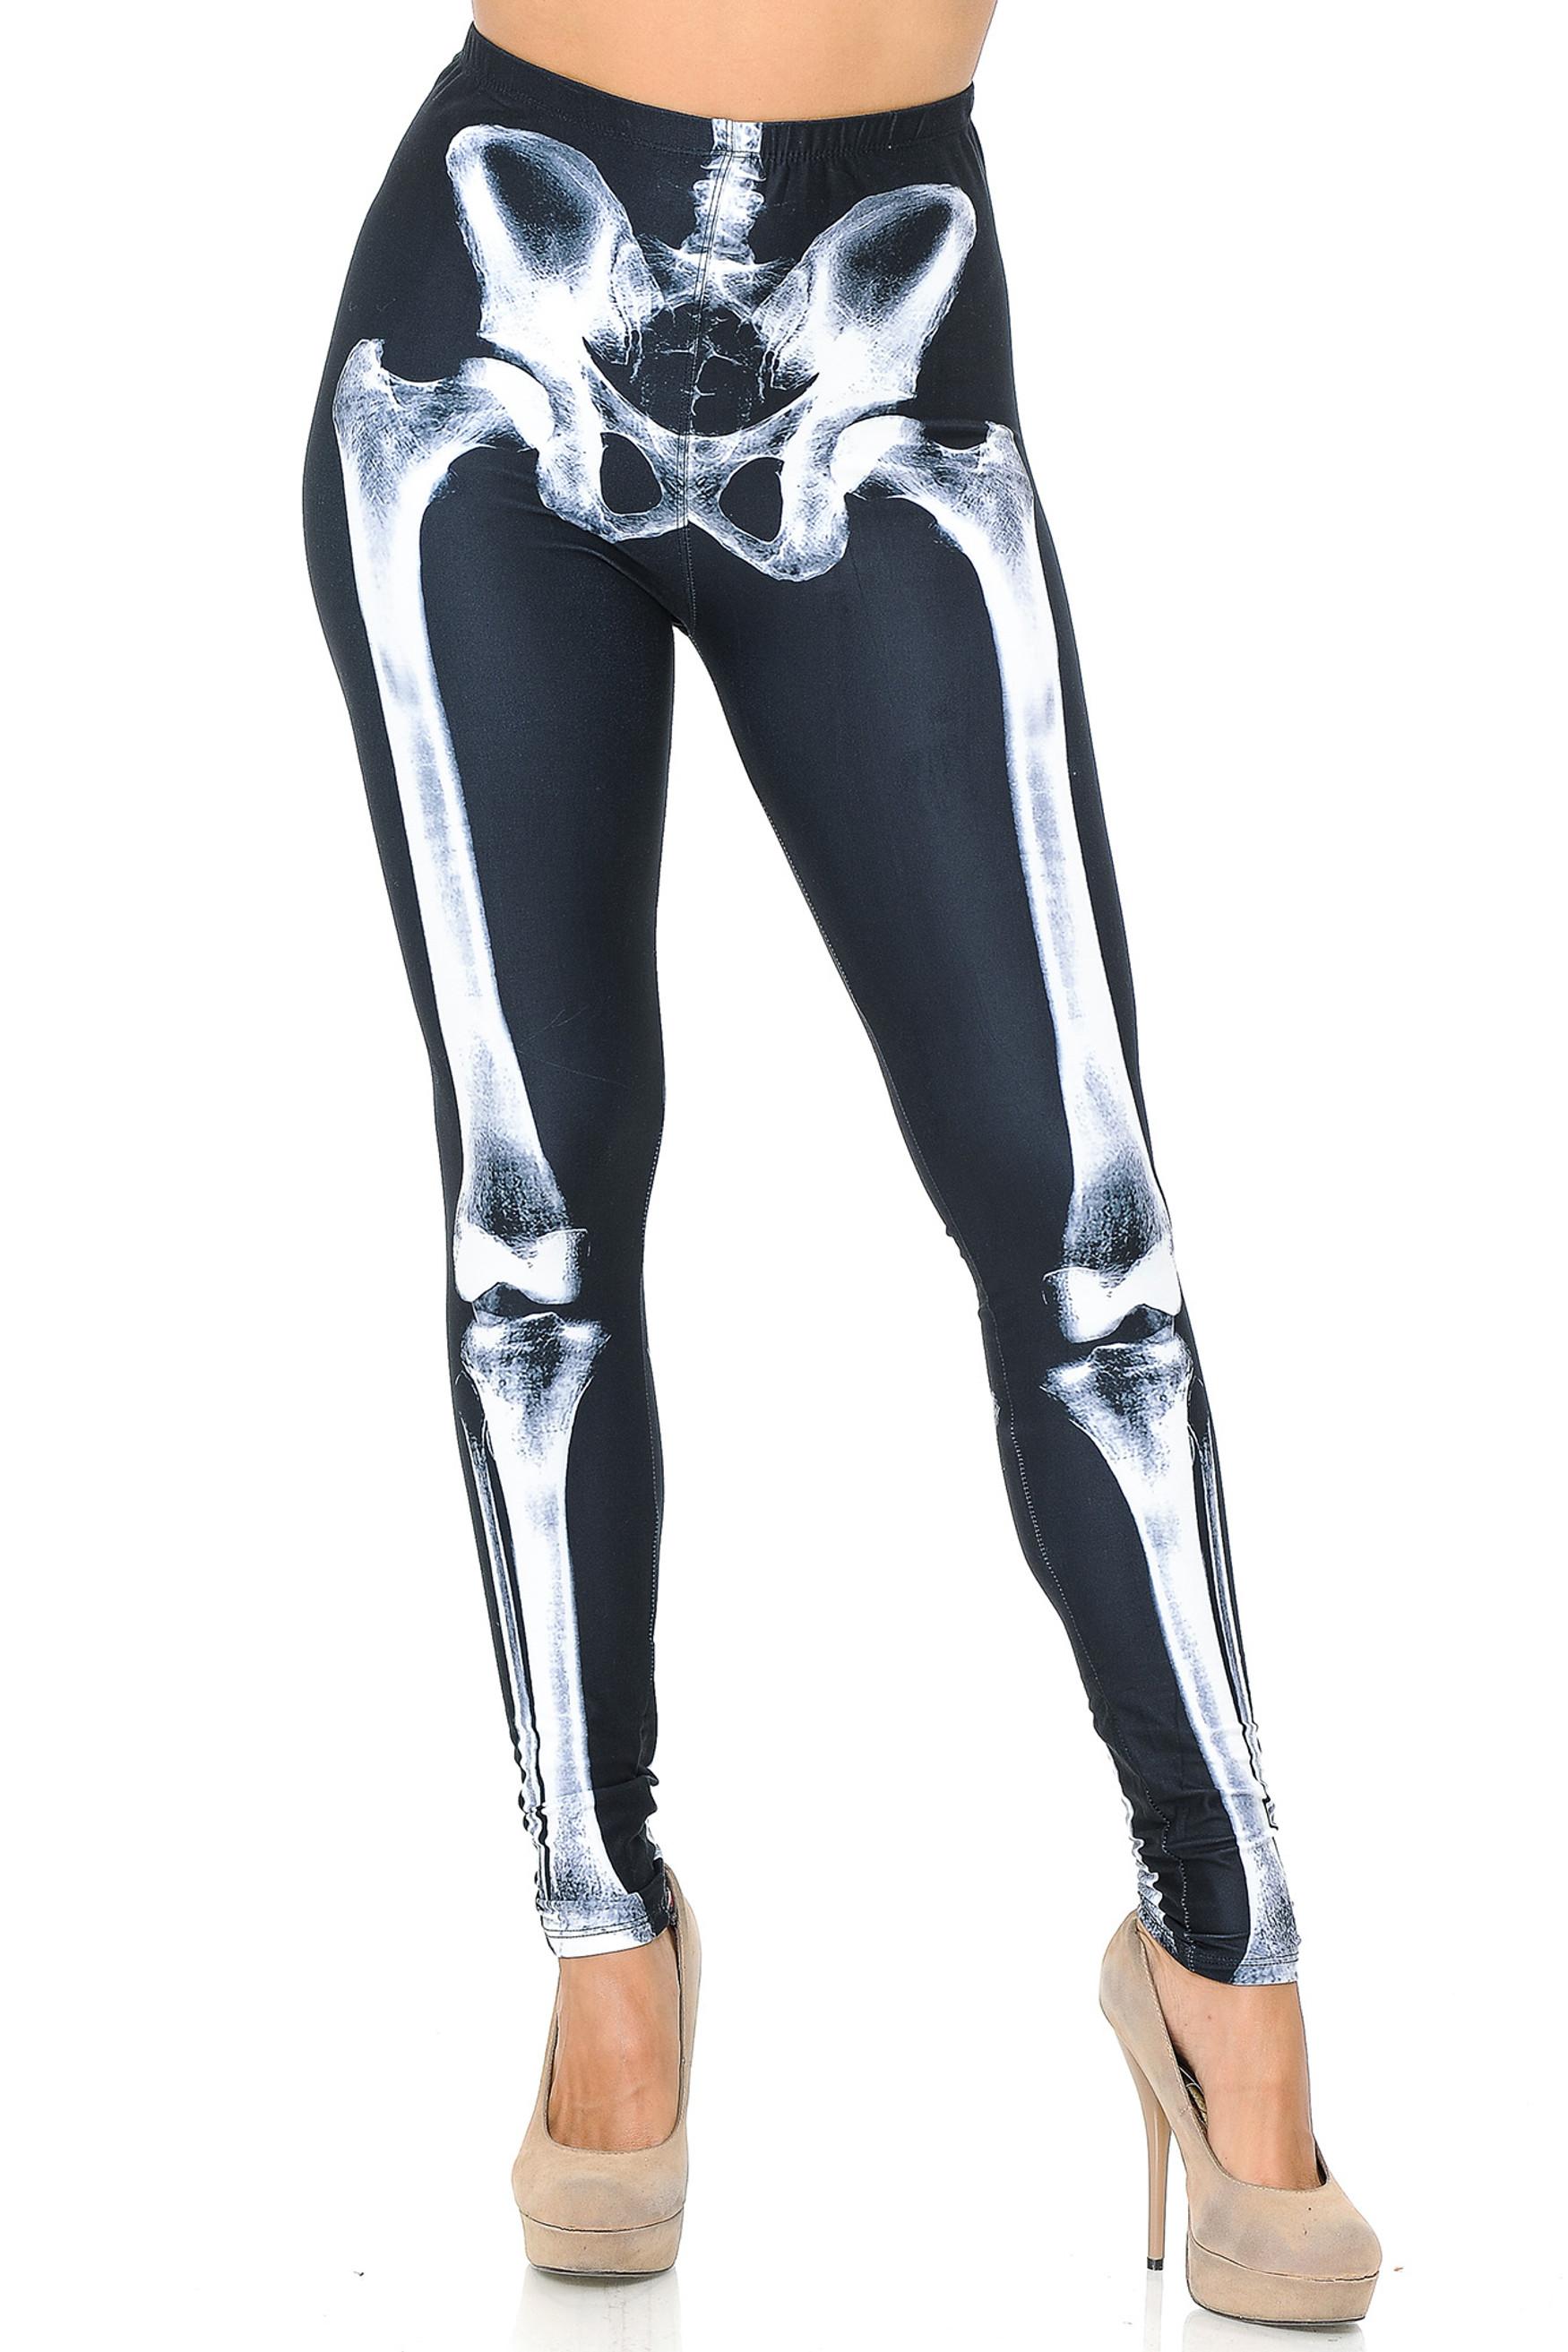 Creamy Soft X-Ray Skeleton Bones Leggings - USA Fashion™